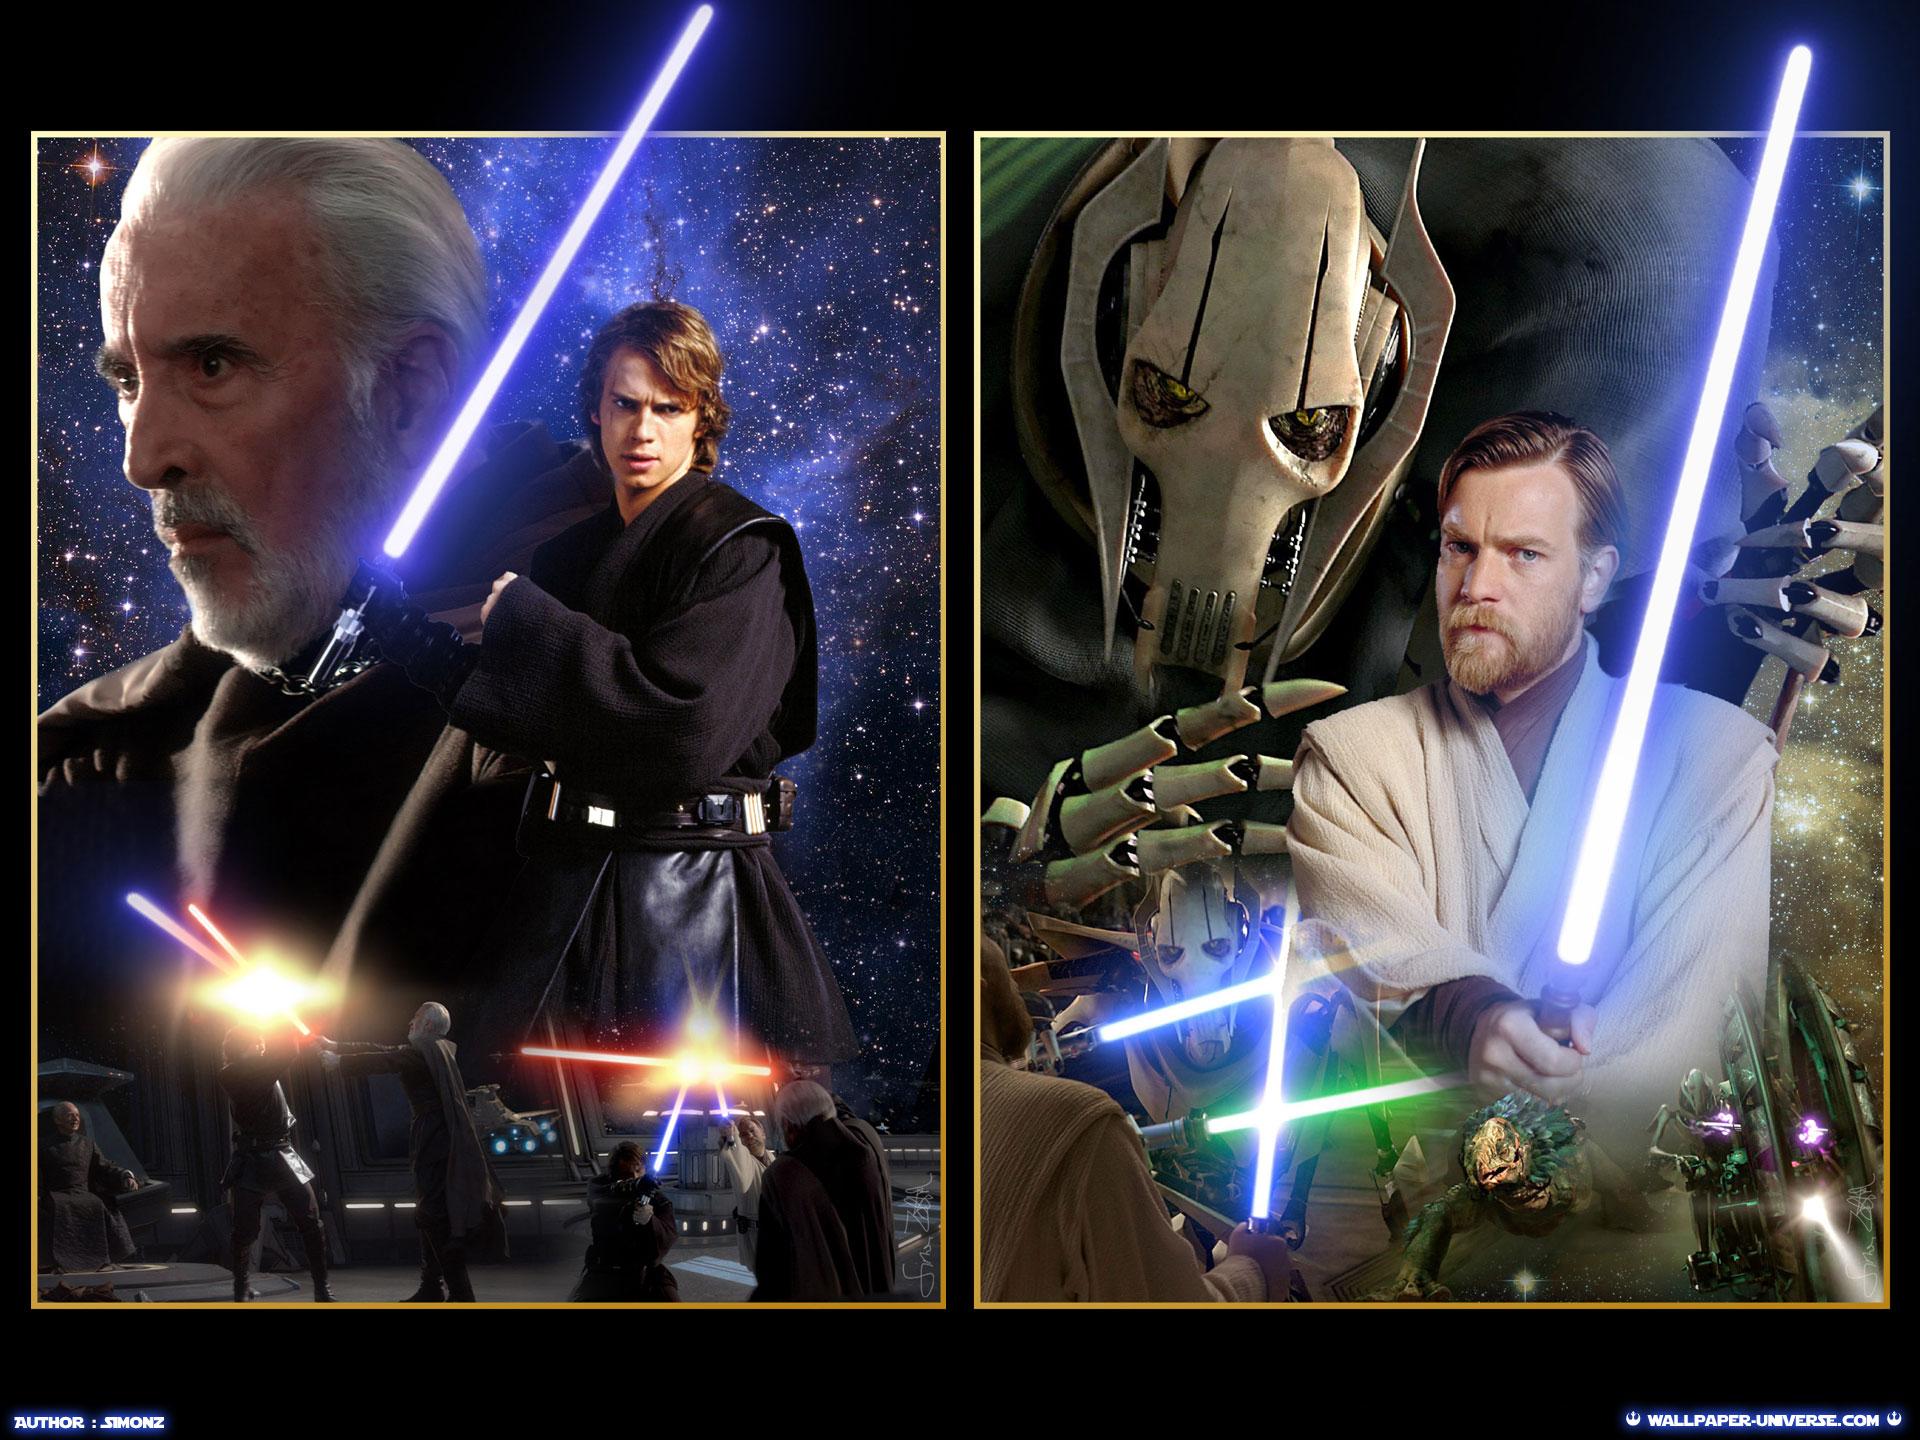 Rots Ep Iii Anakin Vs Dooku Obi Wan Vs General Grievous Estrela Wars Revenge Of The Sith Wallpaper 36272747 Fanpop